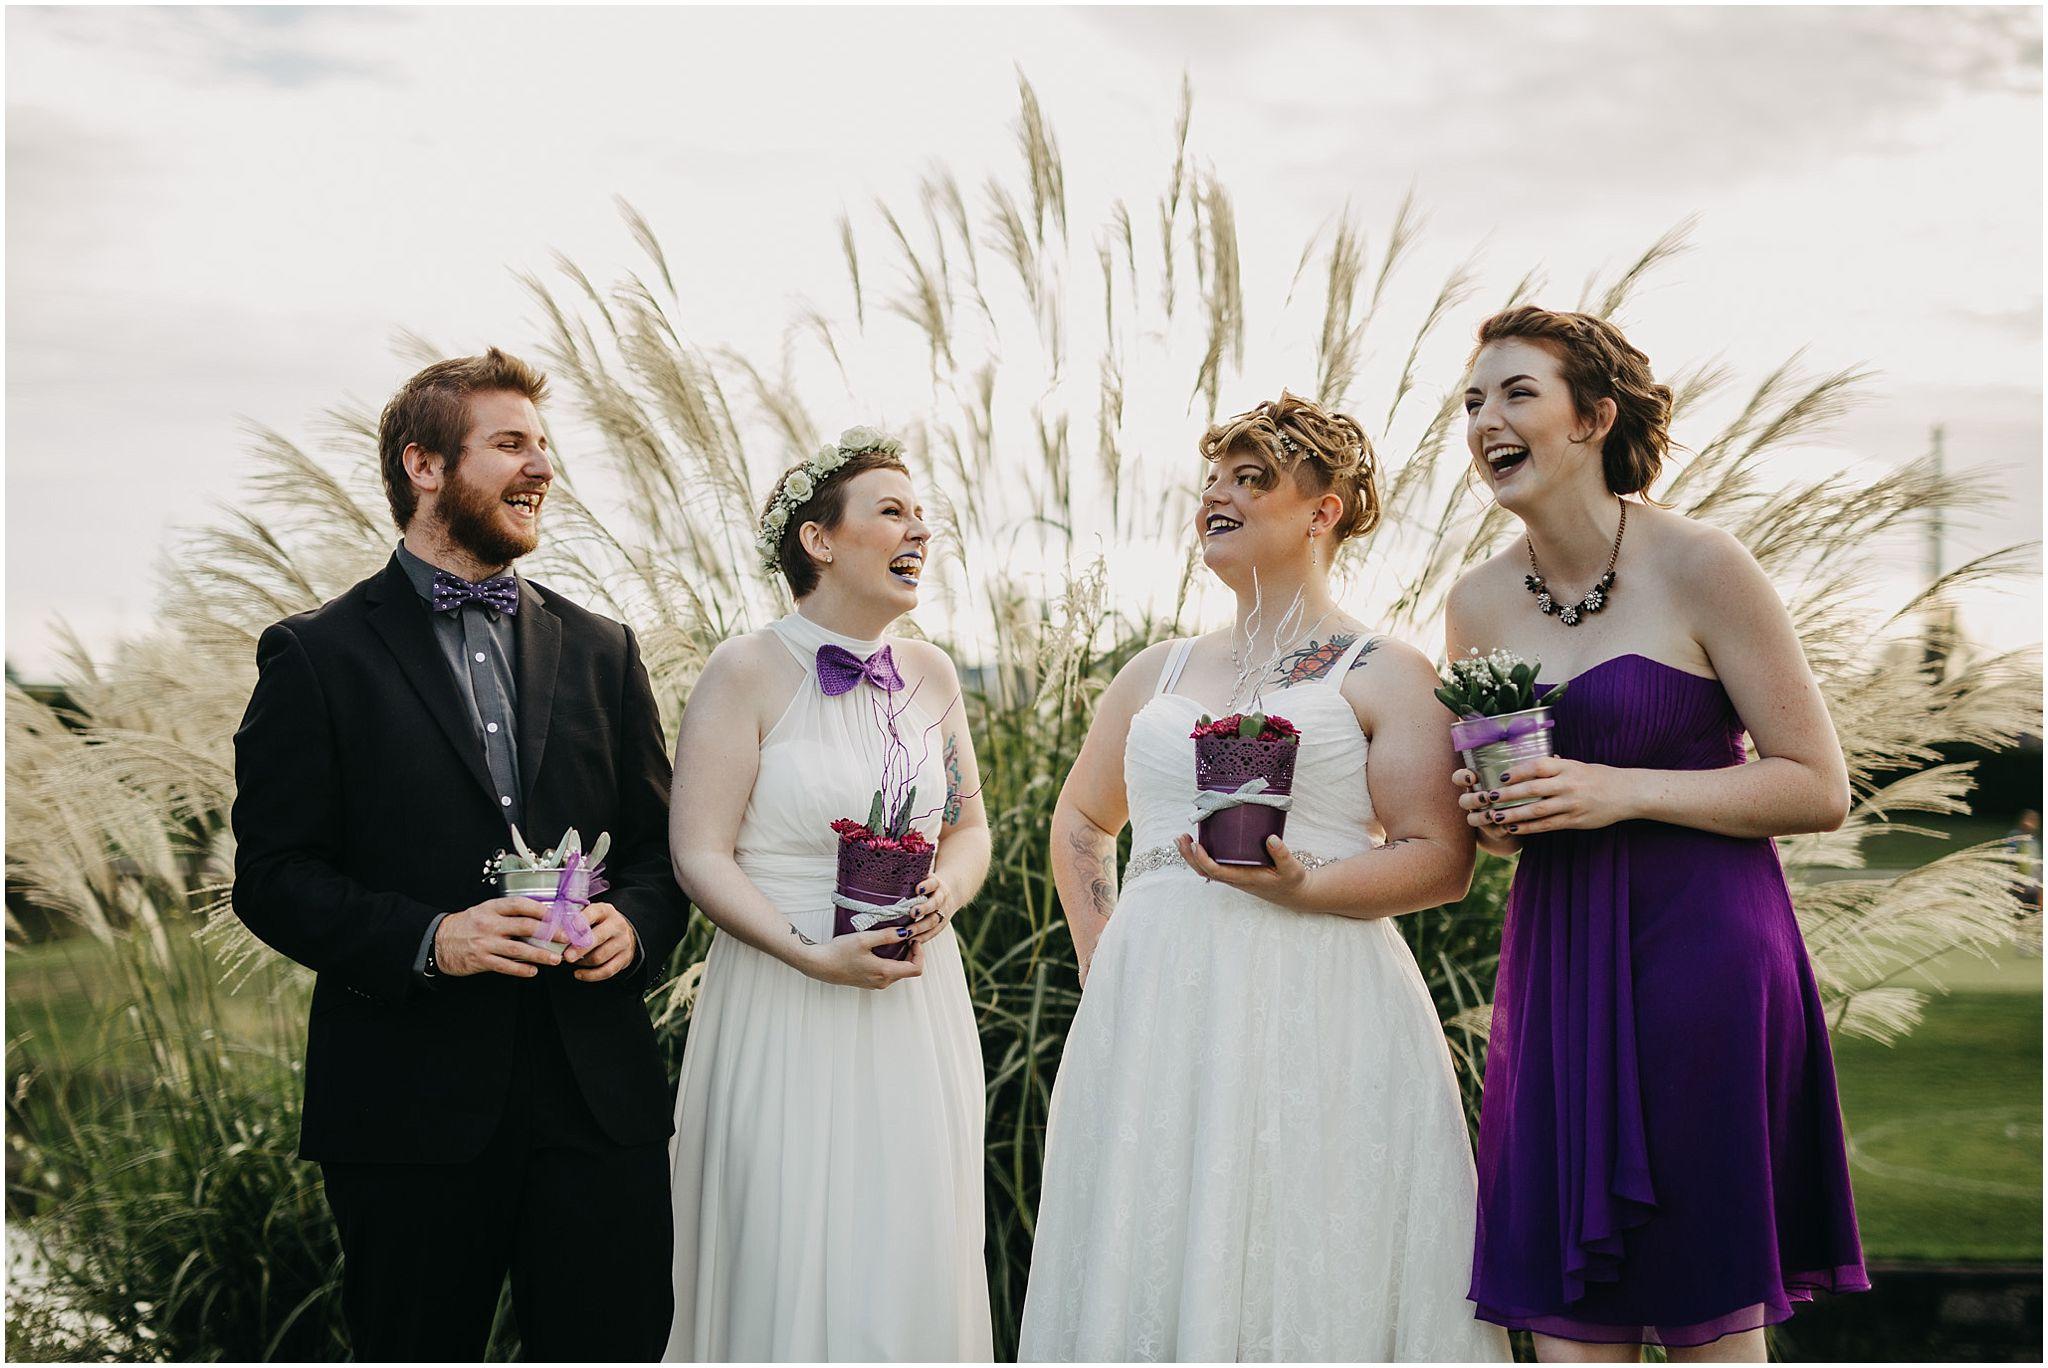 wedding party photo pitt meadows wedding